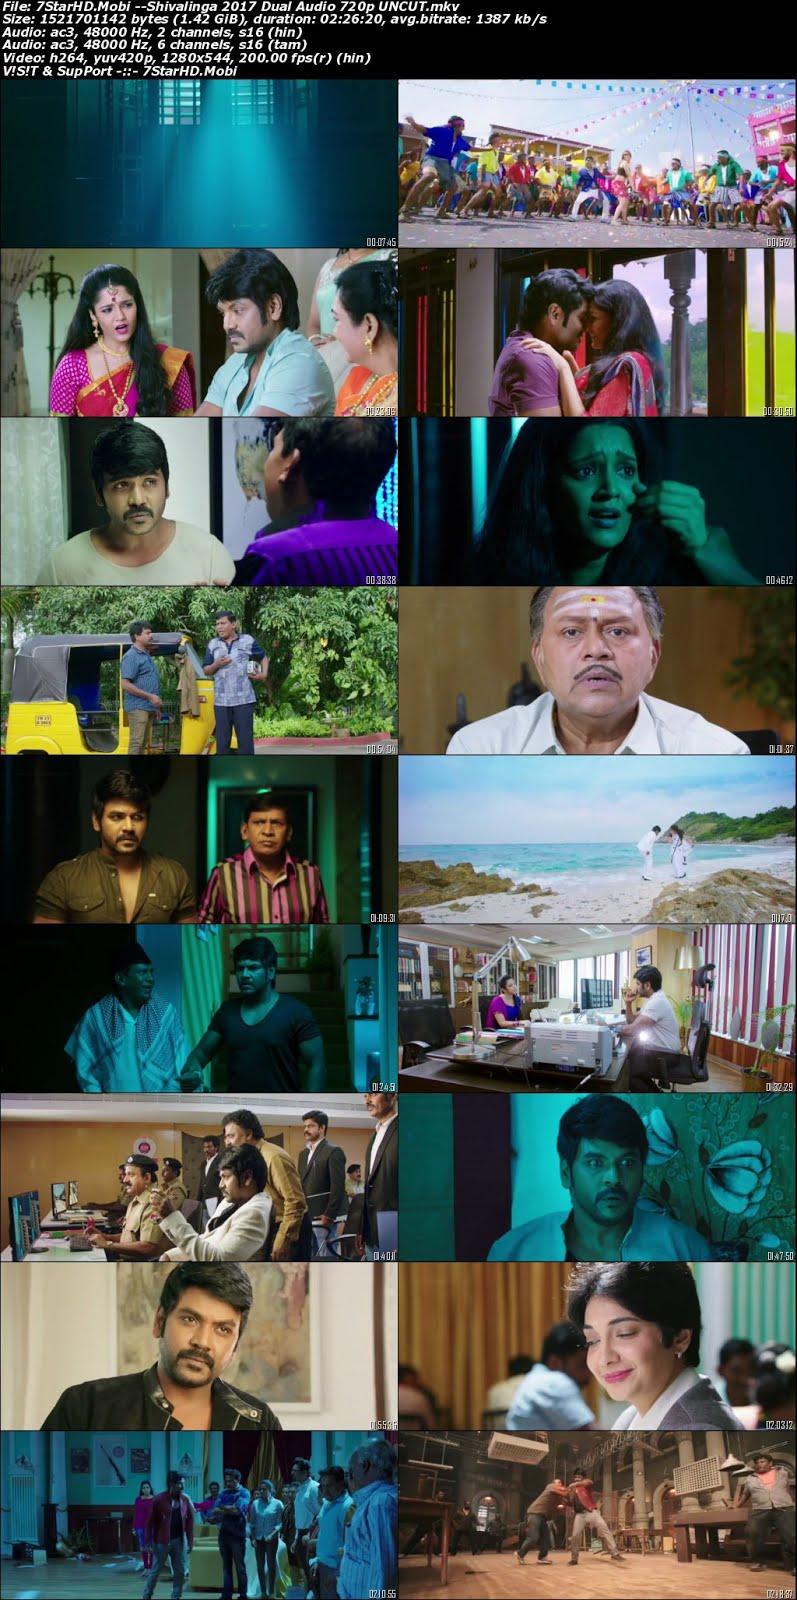 Shivalinga 2017 Dual Audio South Hindi Dubbed Full Movie 450MB UNCUT HDRip 480p x264 ESubs Download